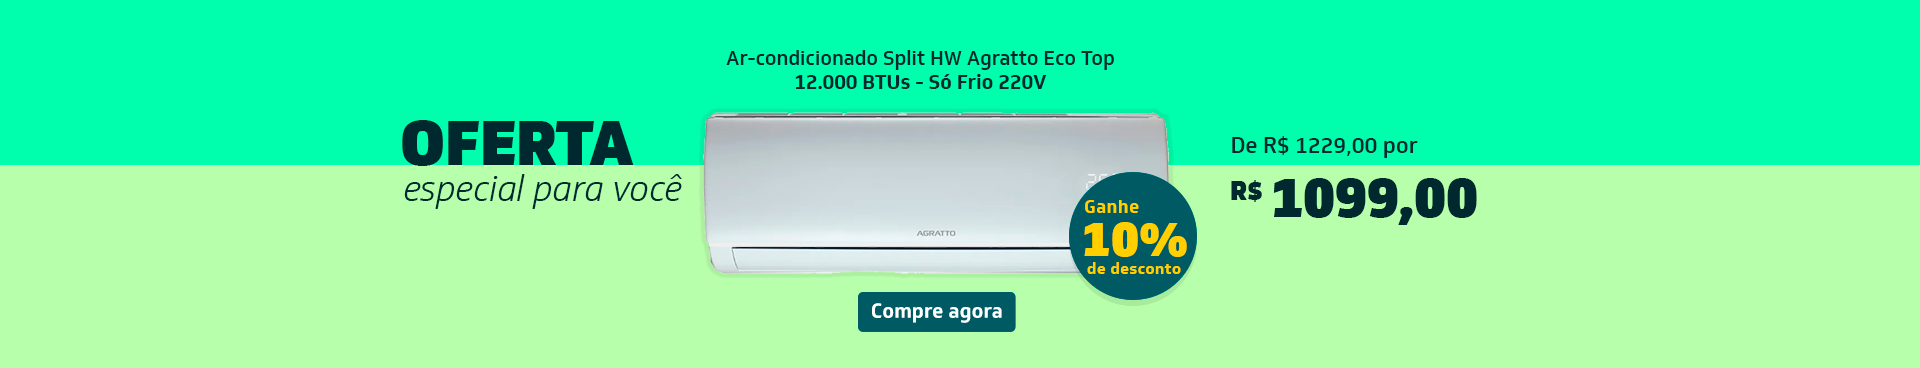 fullbanner-desktop-agratto-150719